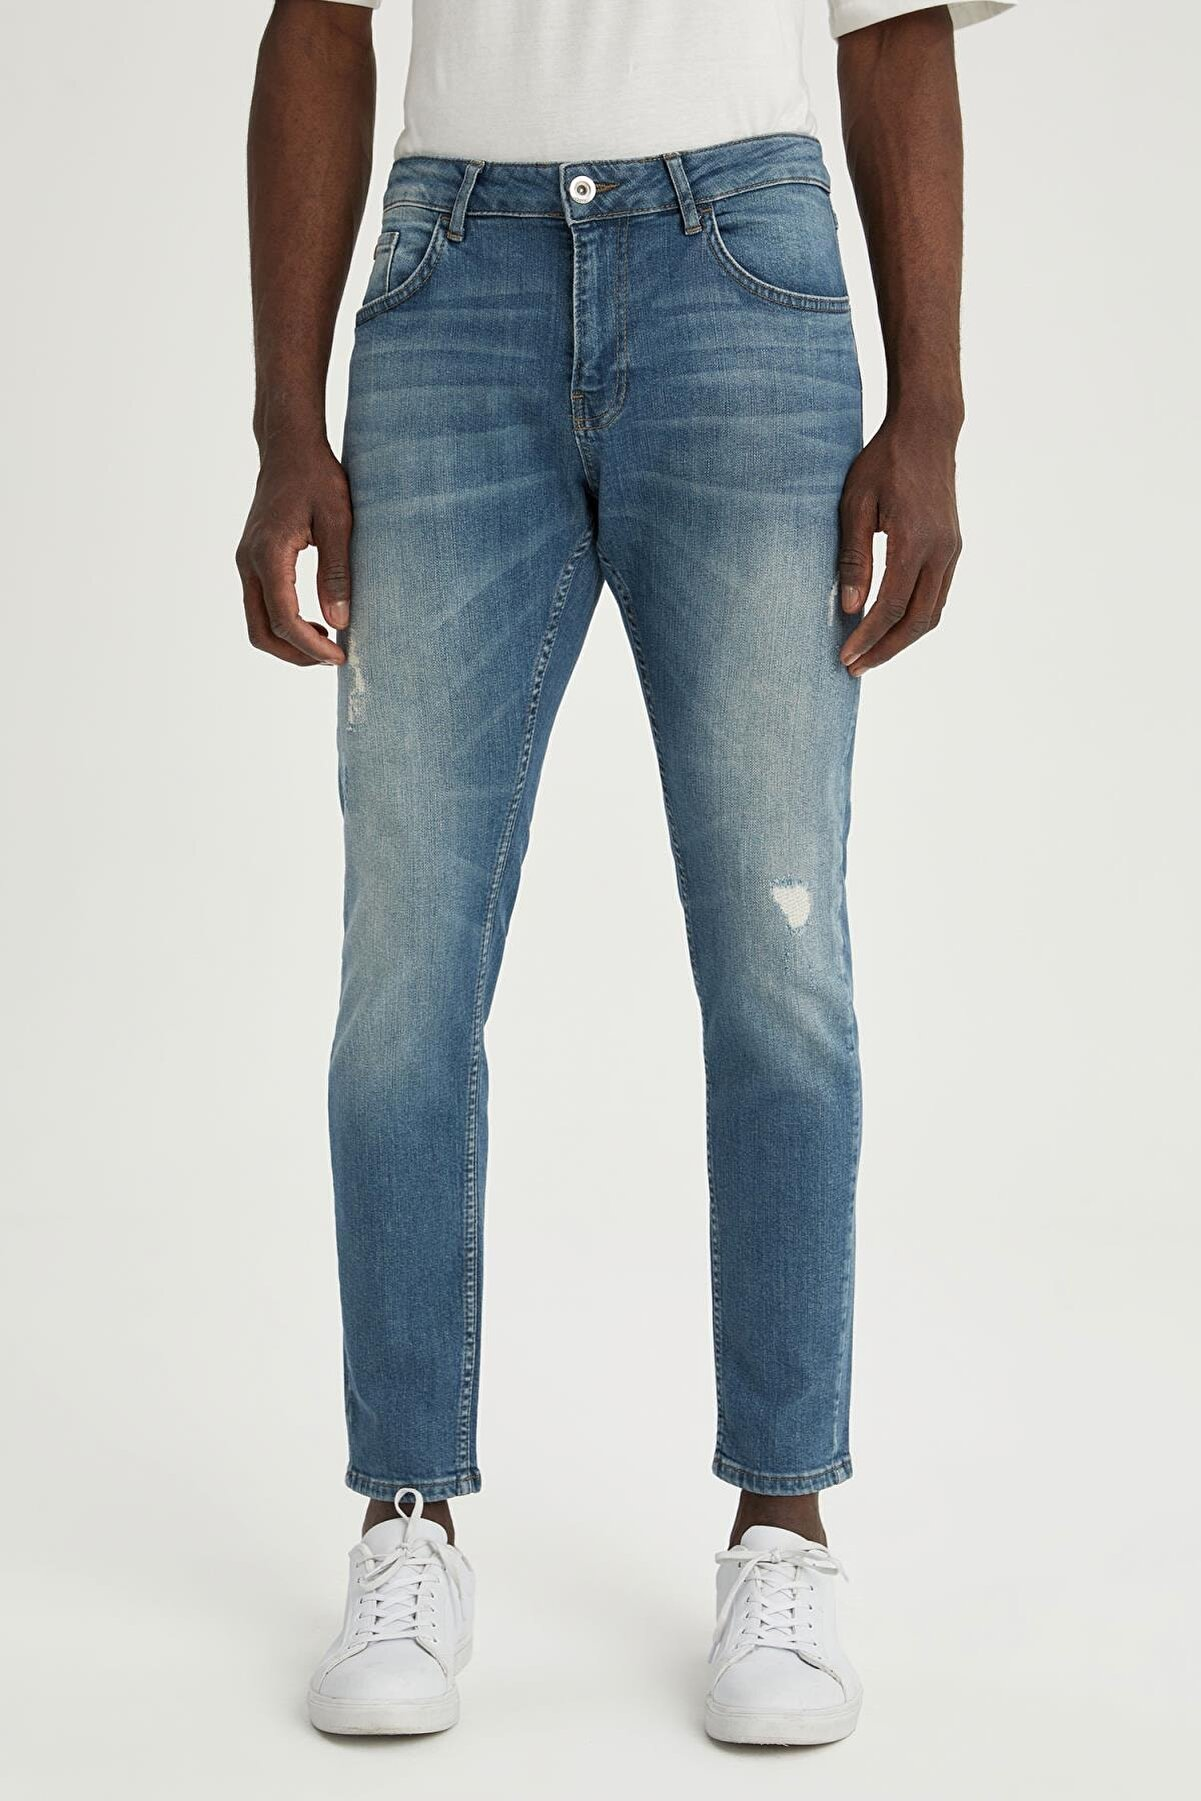 Defacto Erkek Yeşil Skinny Comfort Fit Normal Bel Dar Paça Yırtık Detaylı Jean Pantolon U8447AZ21SM